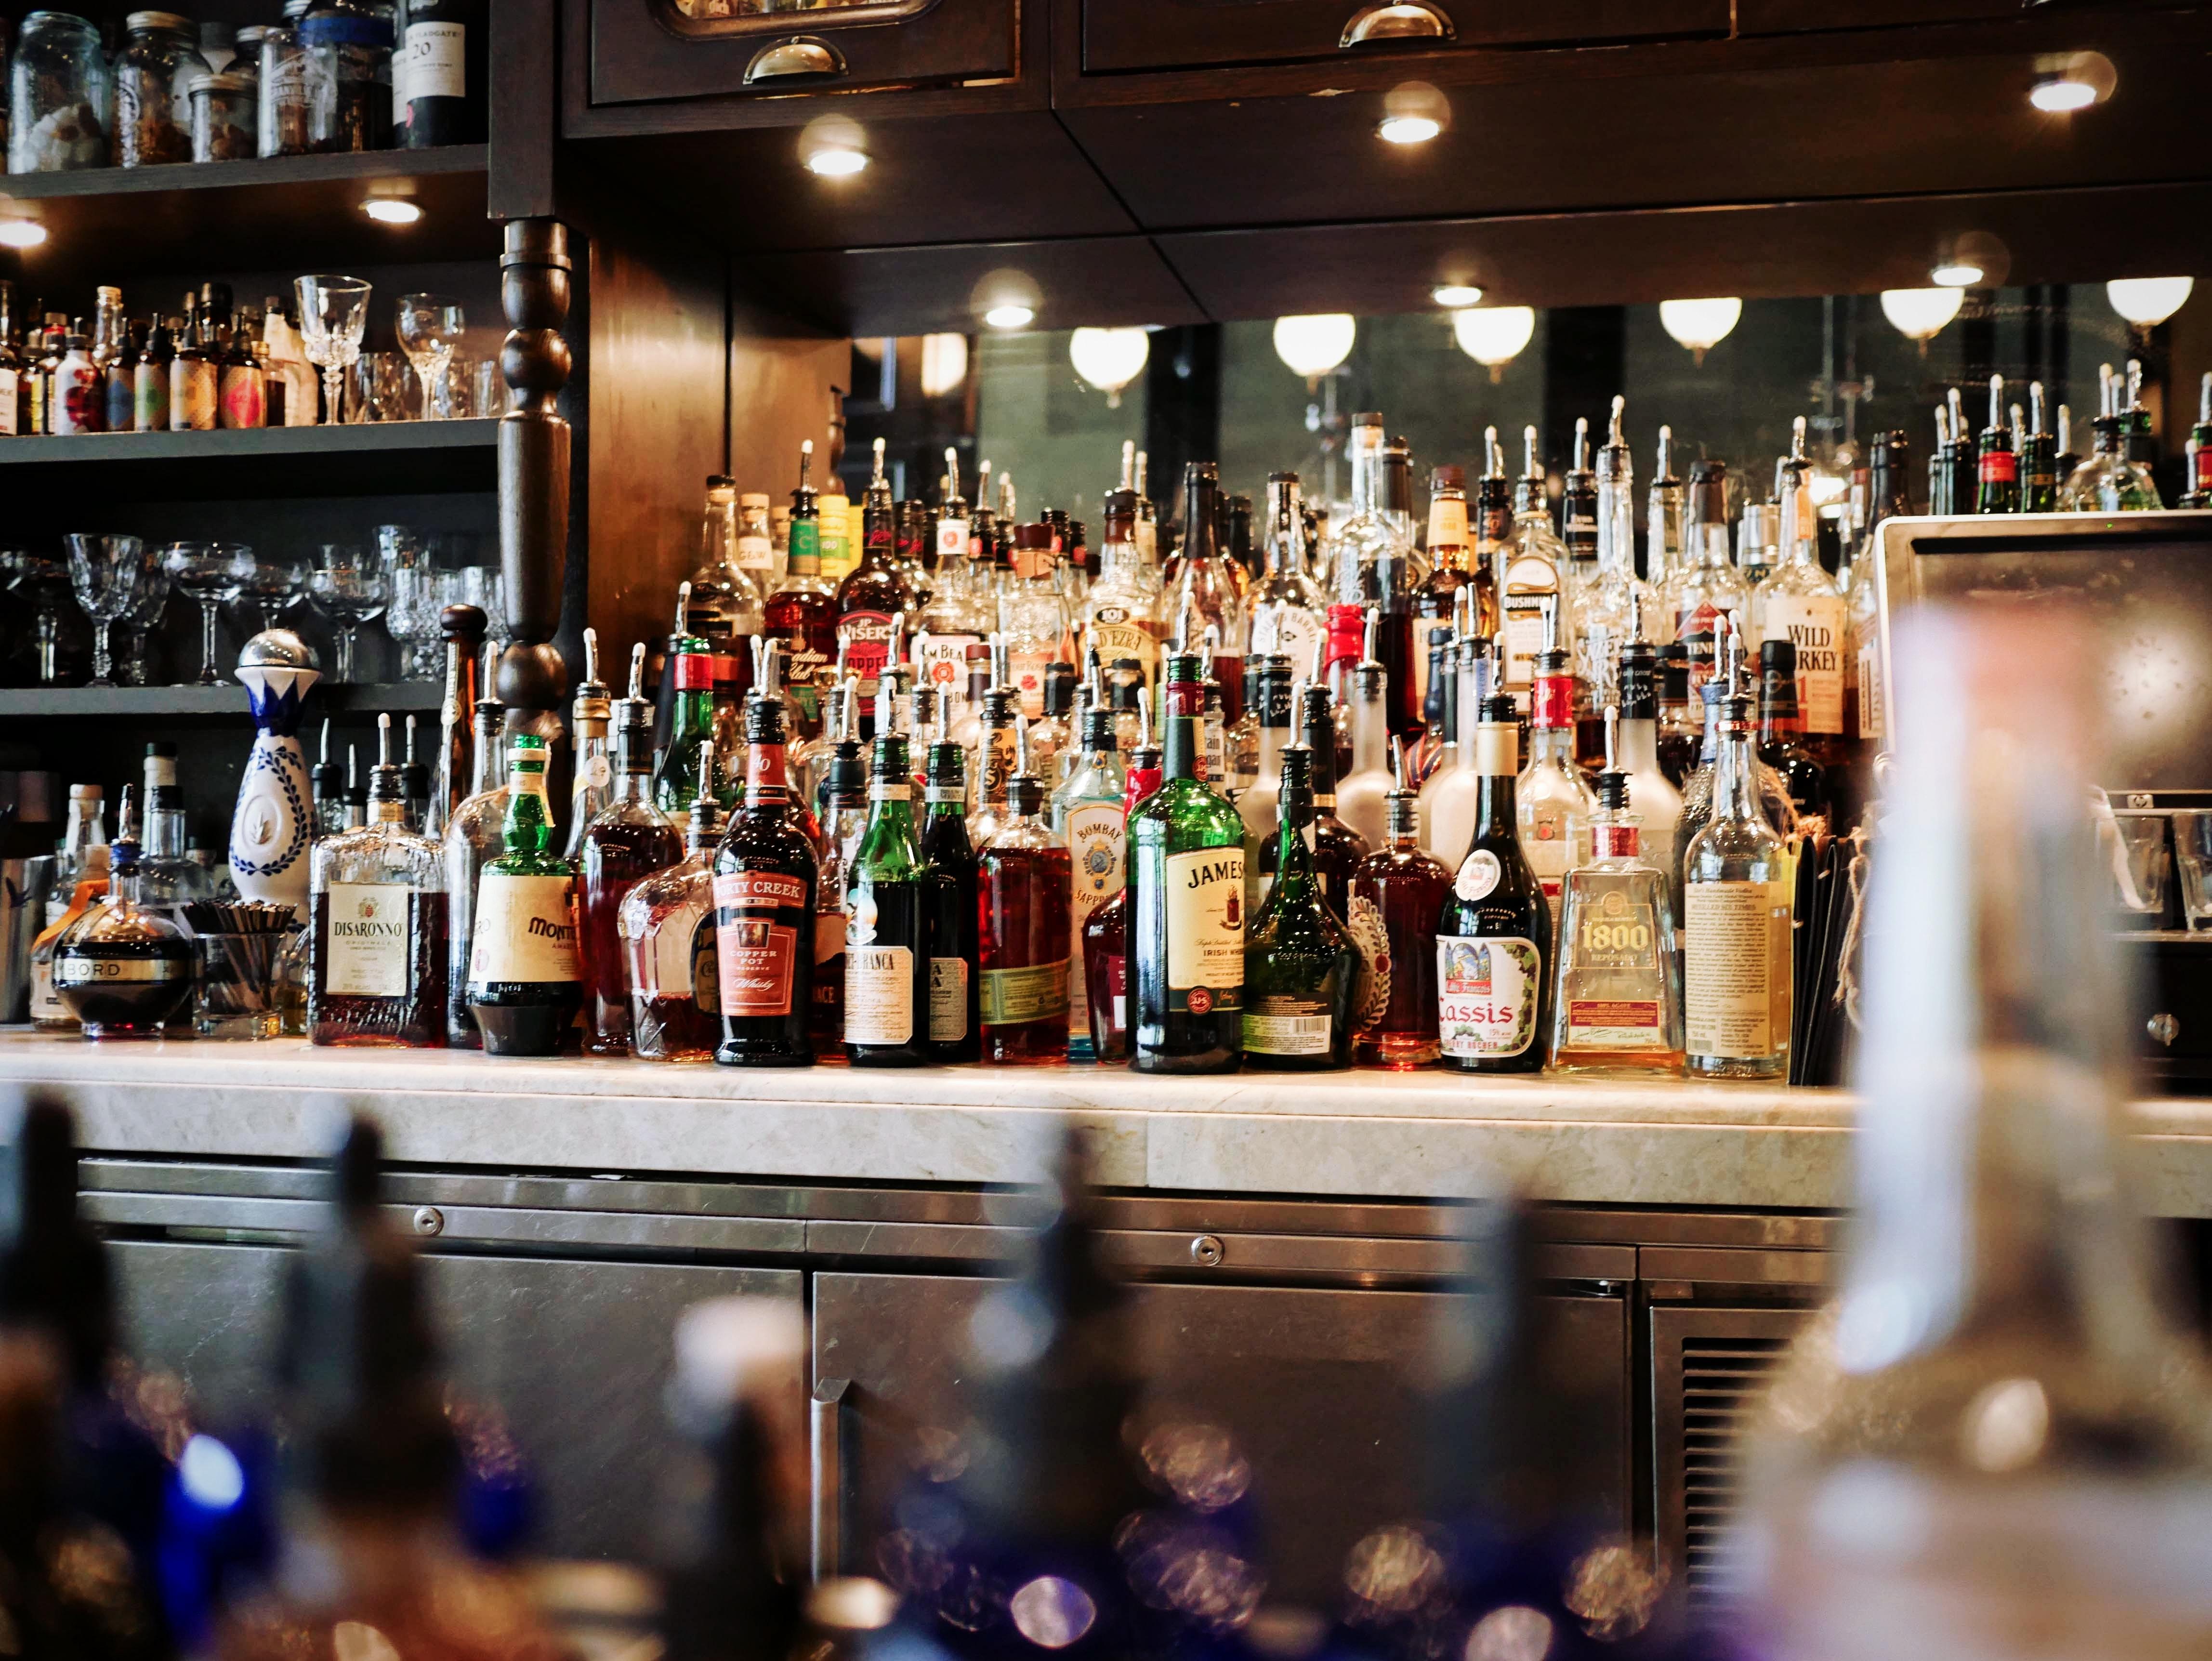 Little Pub – Big on tasty food & outstanding service